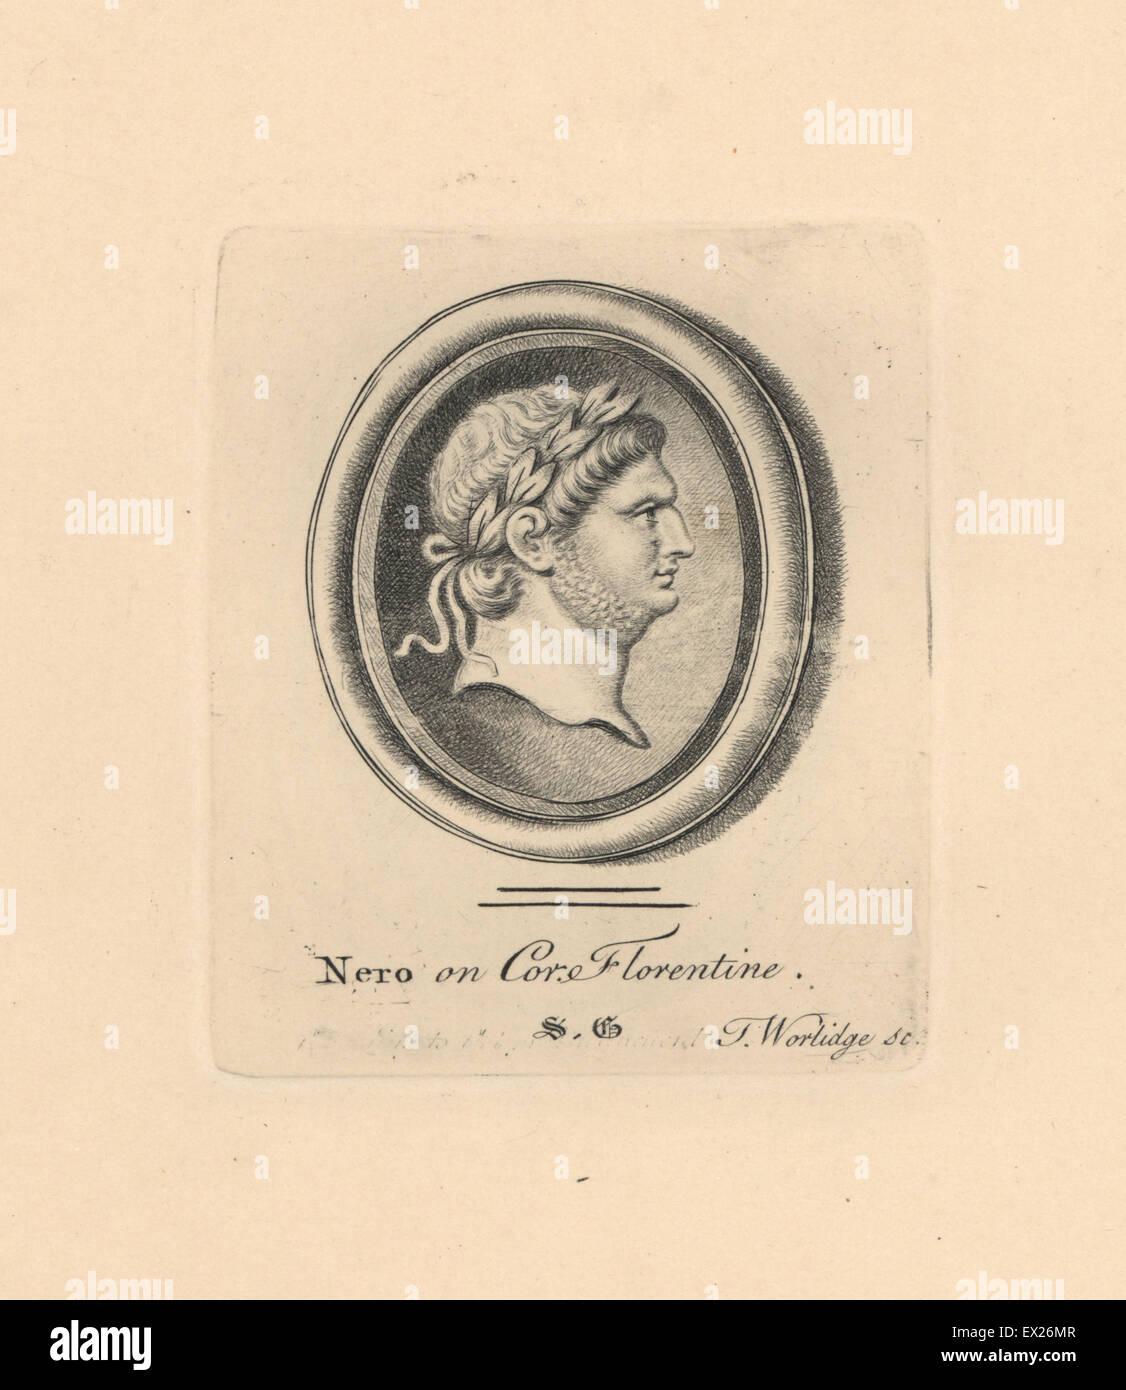 Portrait of Nero, Roman Emperor, in laurel wreath, engraved on Florentine cornelian. Copperplate engraving by Thomas - Stock Image